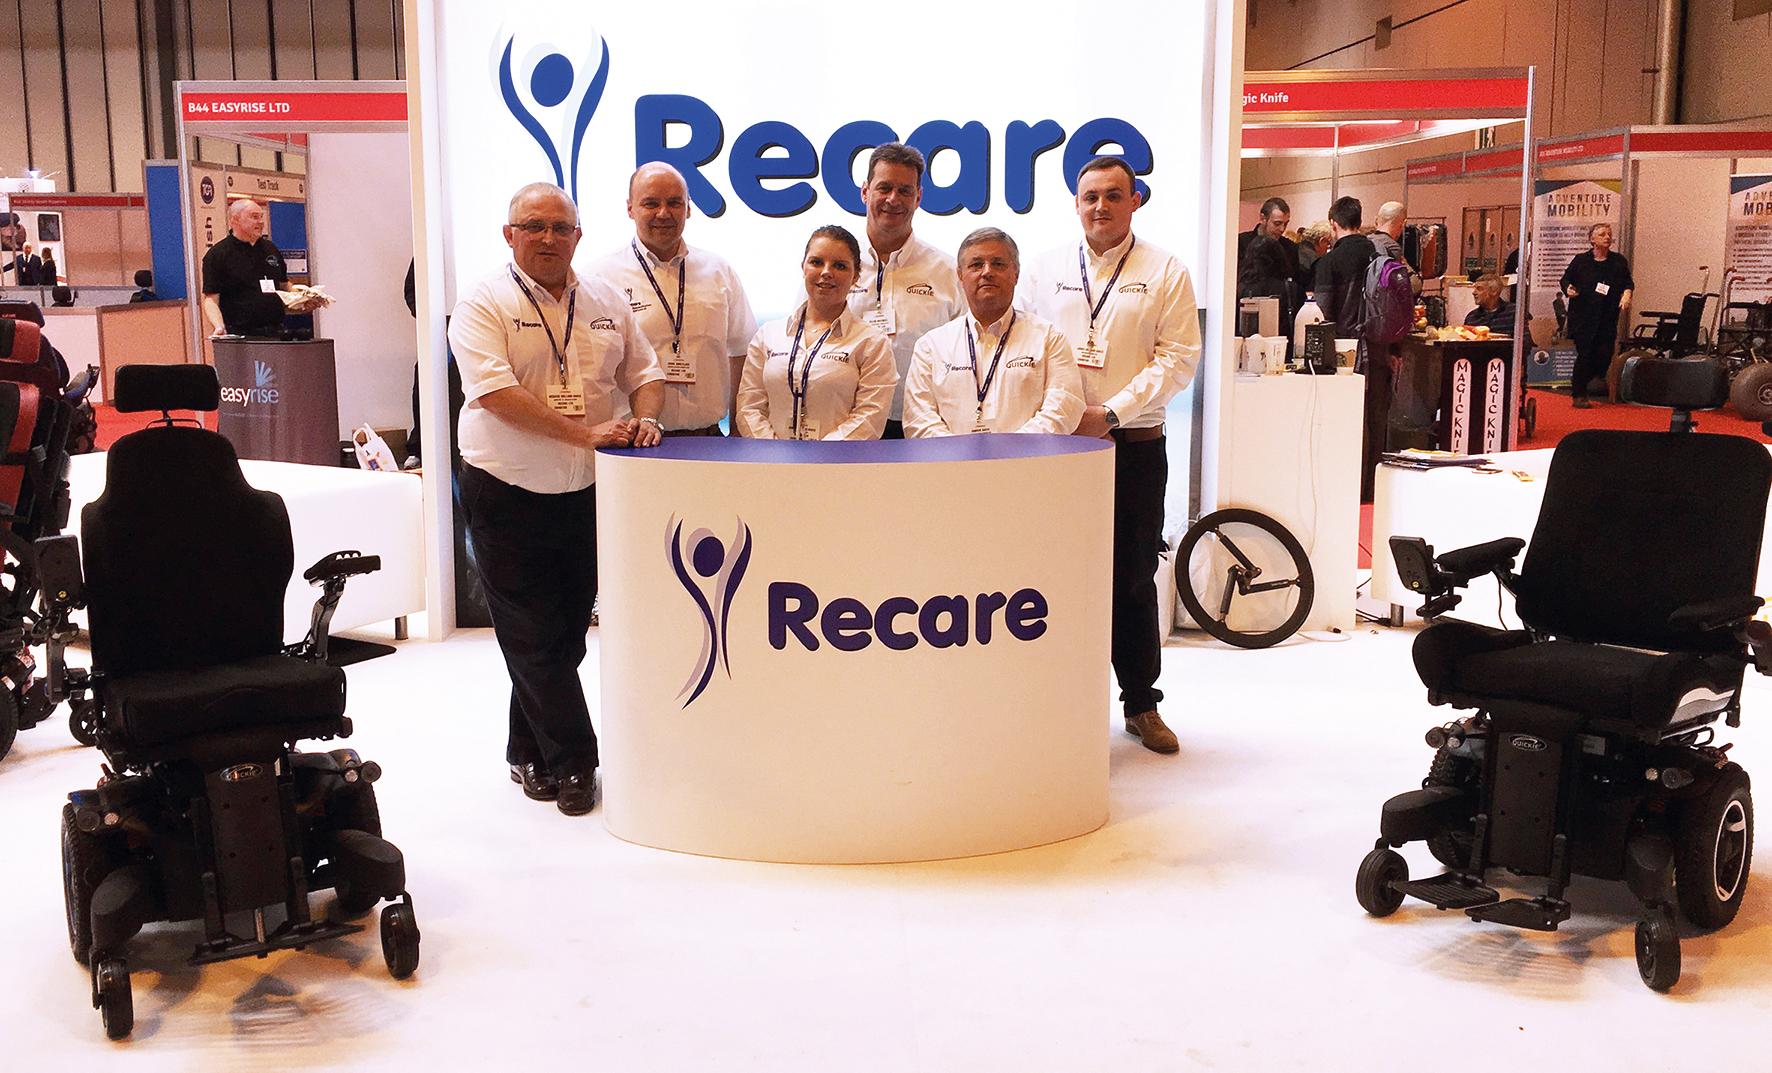 Recare_Naidex_Team_sml